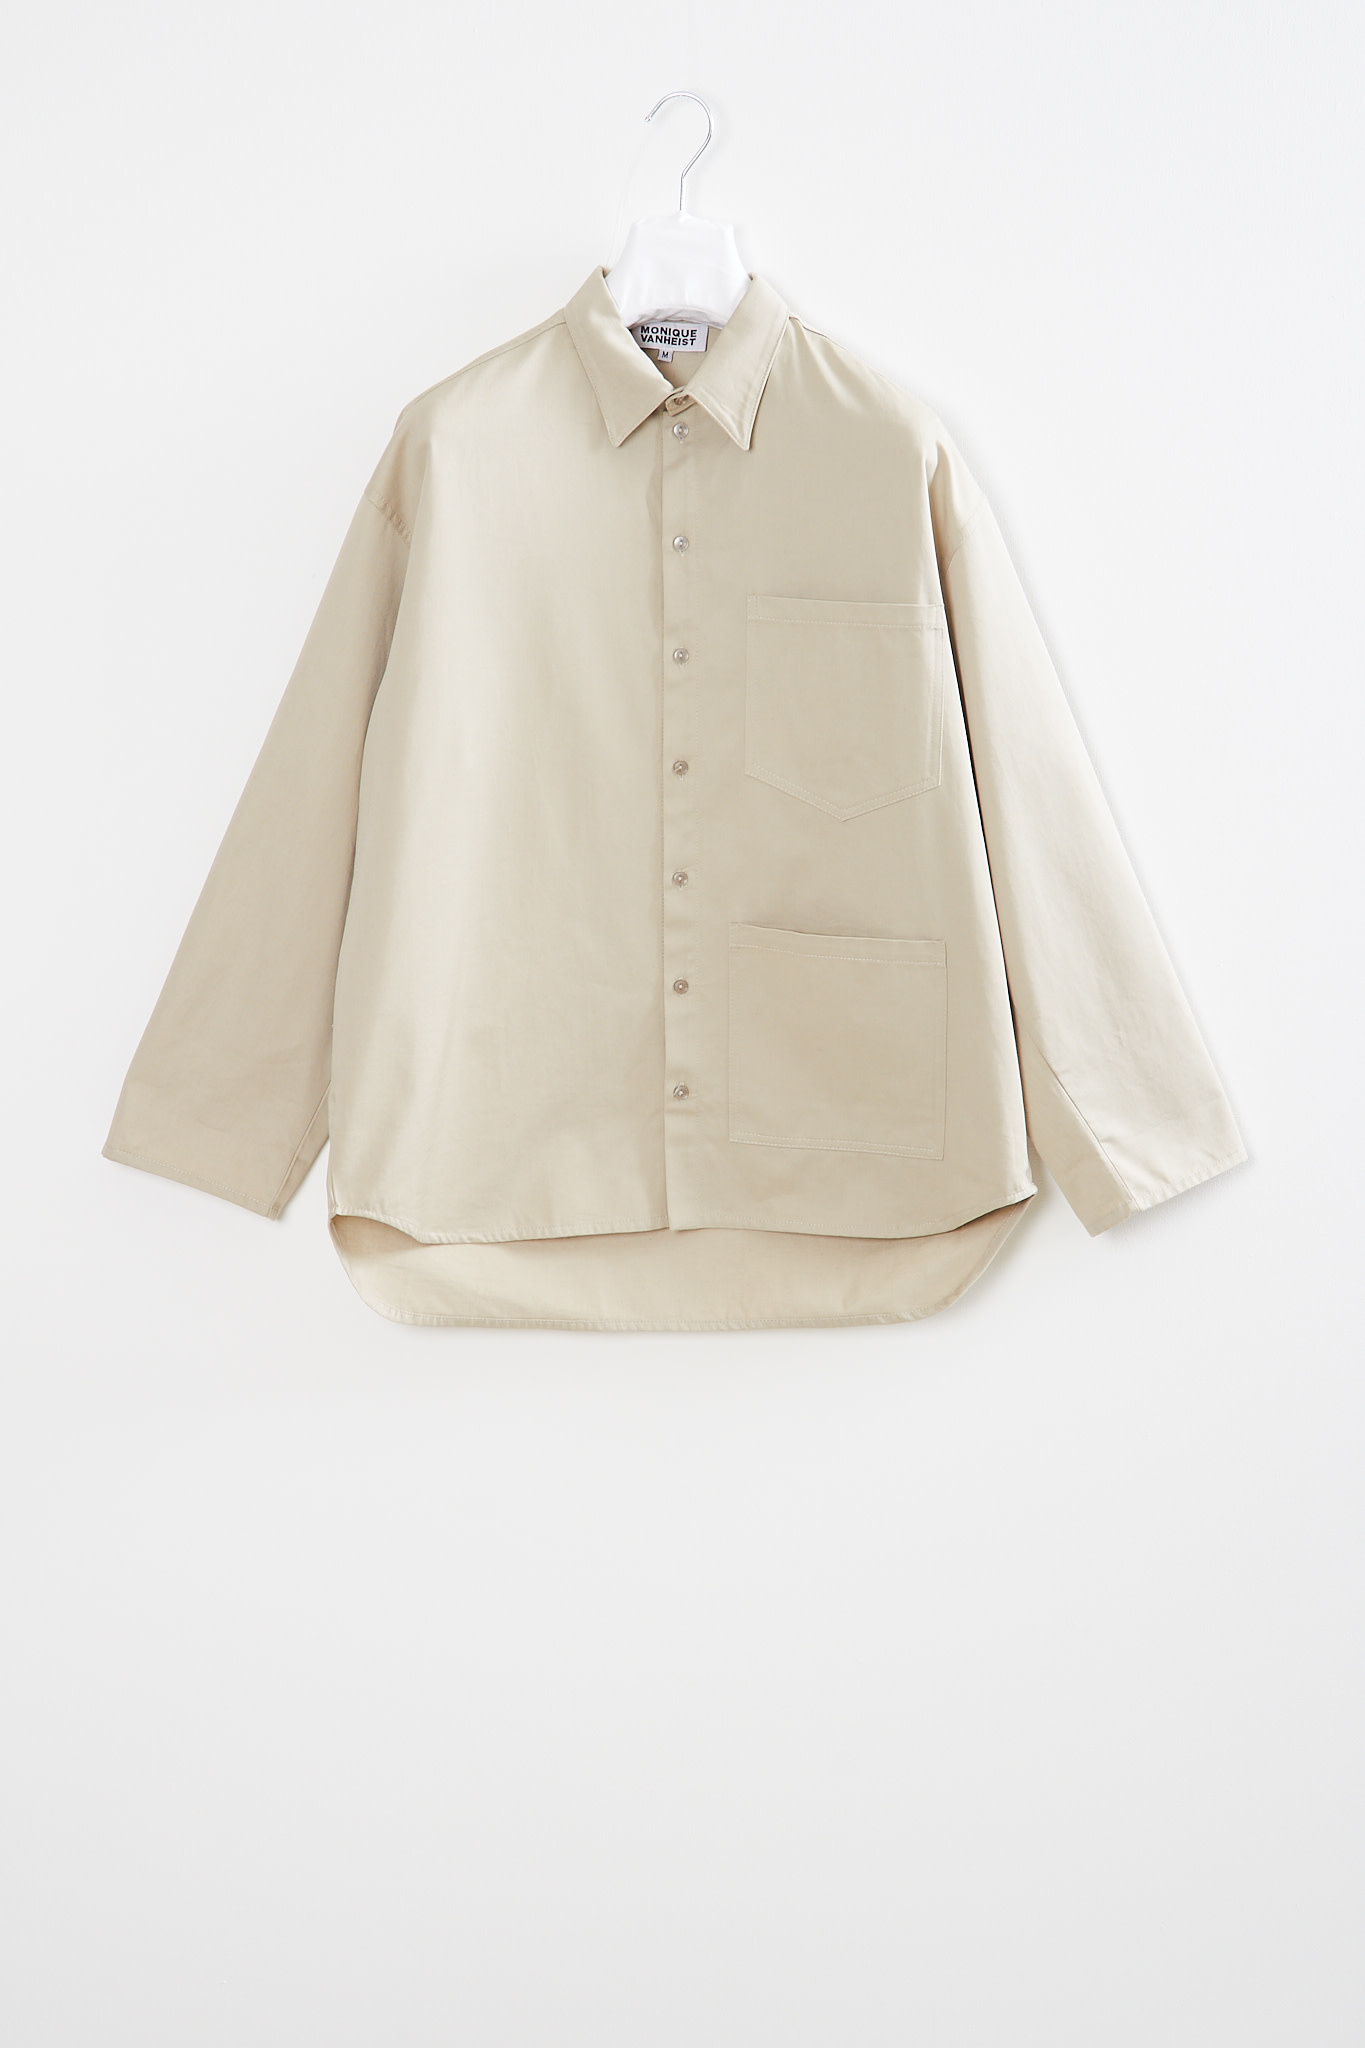 Monique van Heist - 5.2 organic cotton shirt